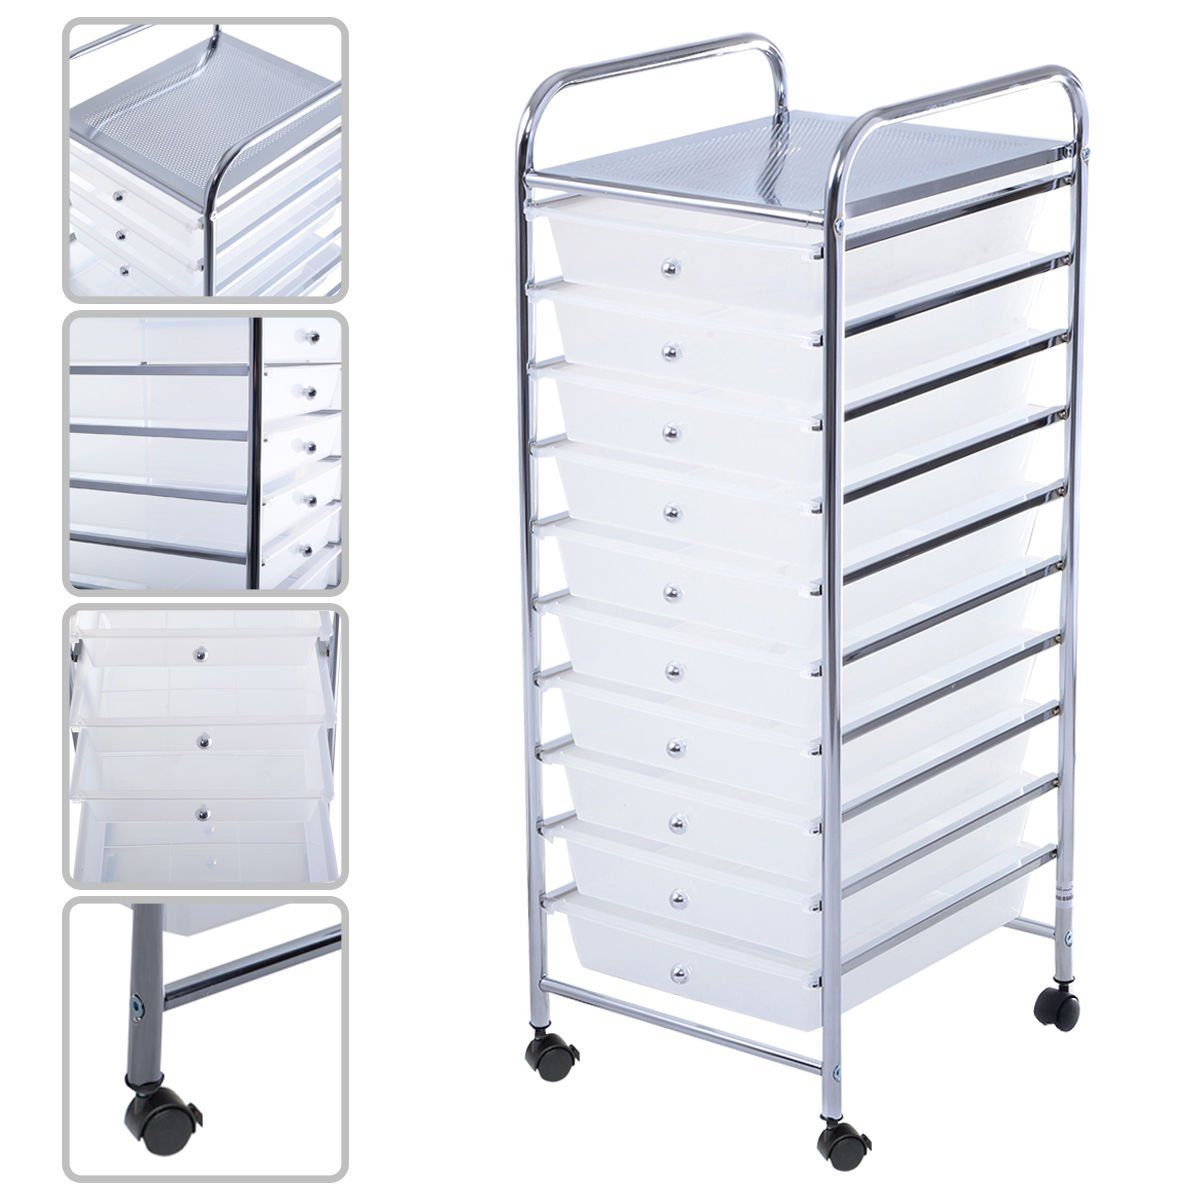 Costway 10 Drawer Rolling Storage Cart Scrapbook Paper Office School Organizer Clear Walmart Com In 2020 Rolling Storage Storage Cart Rolling Storage Cart